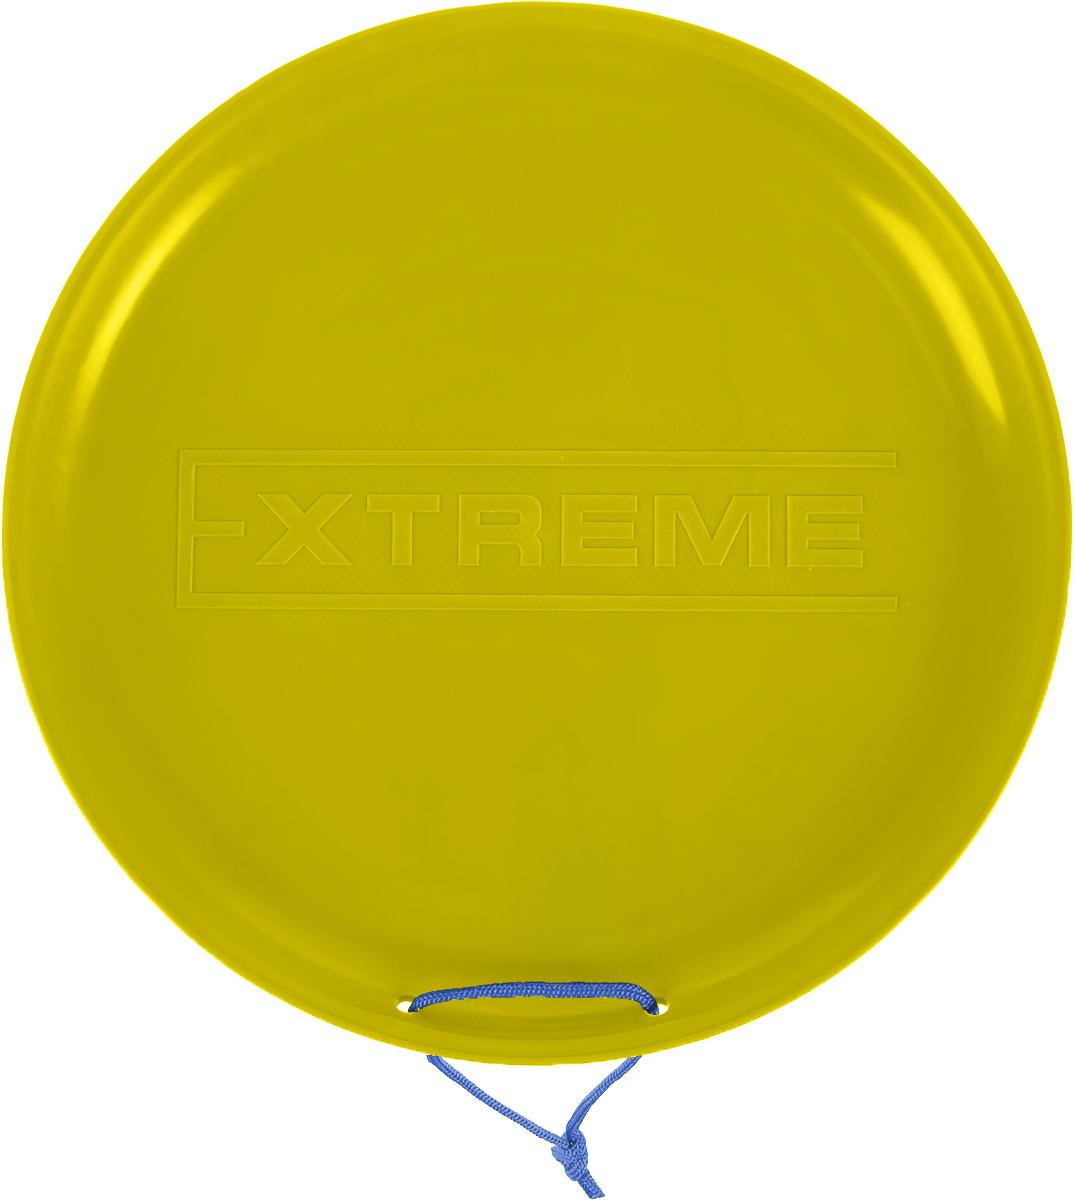 "Фото Санки-ледянки Престиж ""Экстрим"", цвет: желтый, диаметр 40 см"